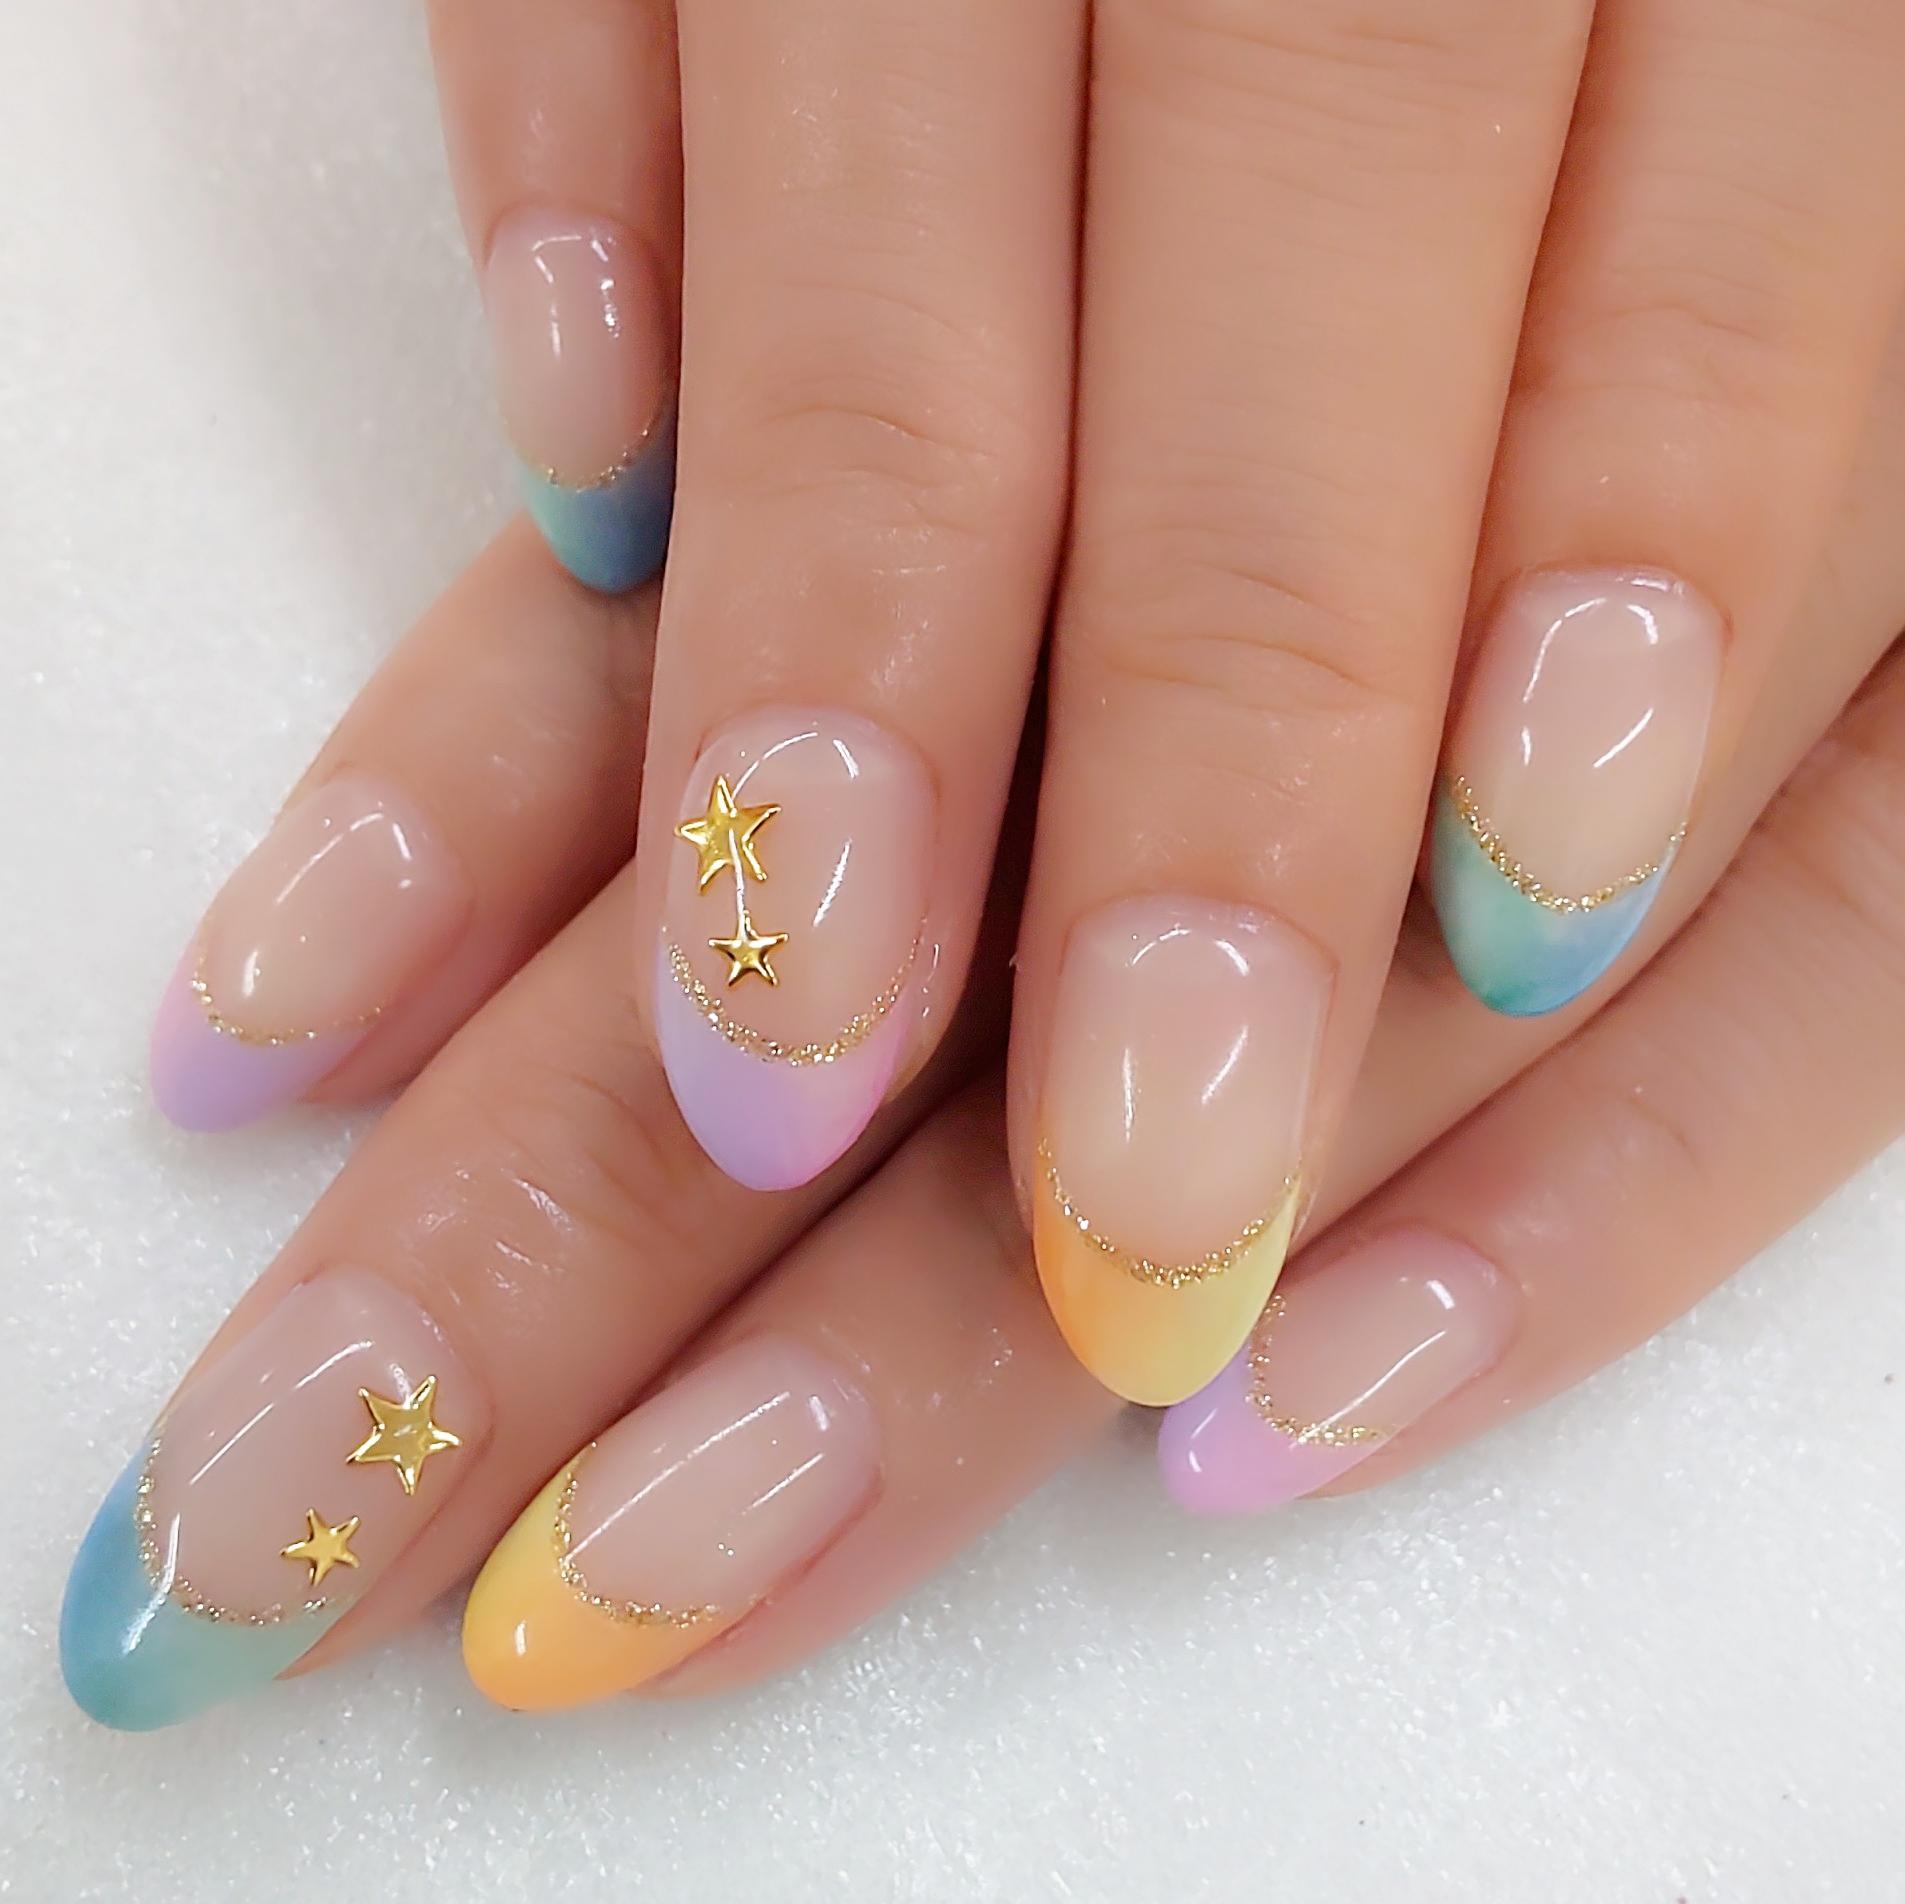 BeautyPlus_20190729225903750_save